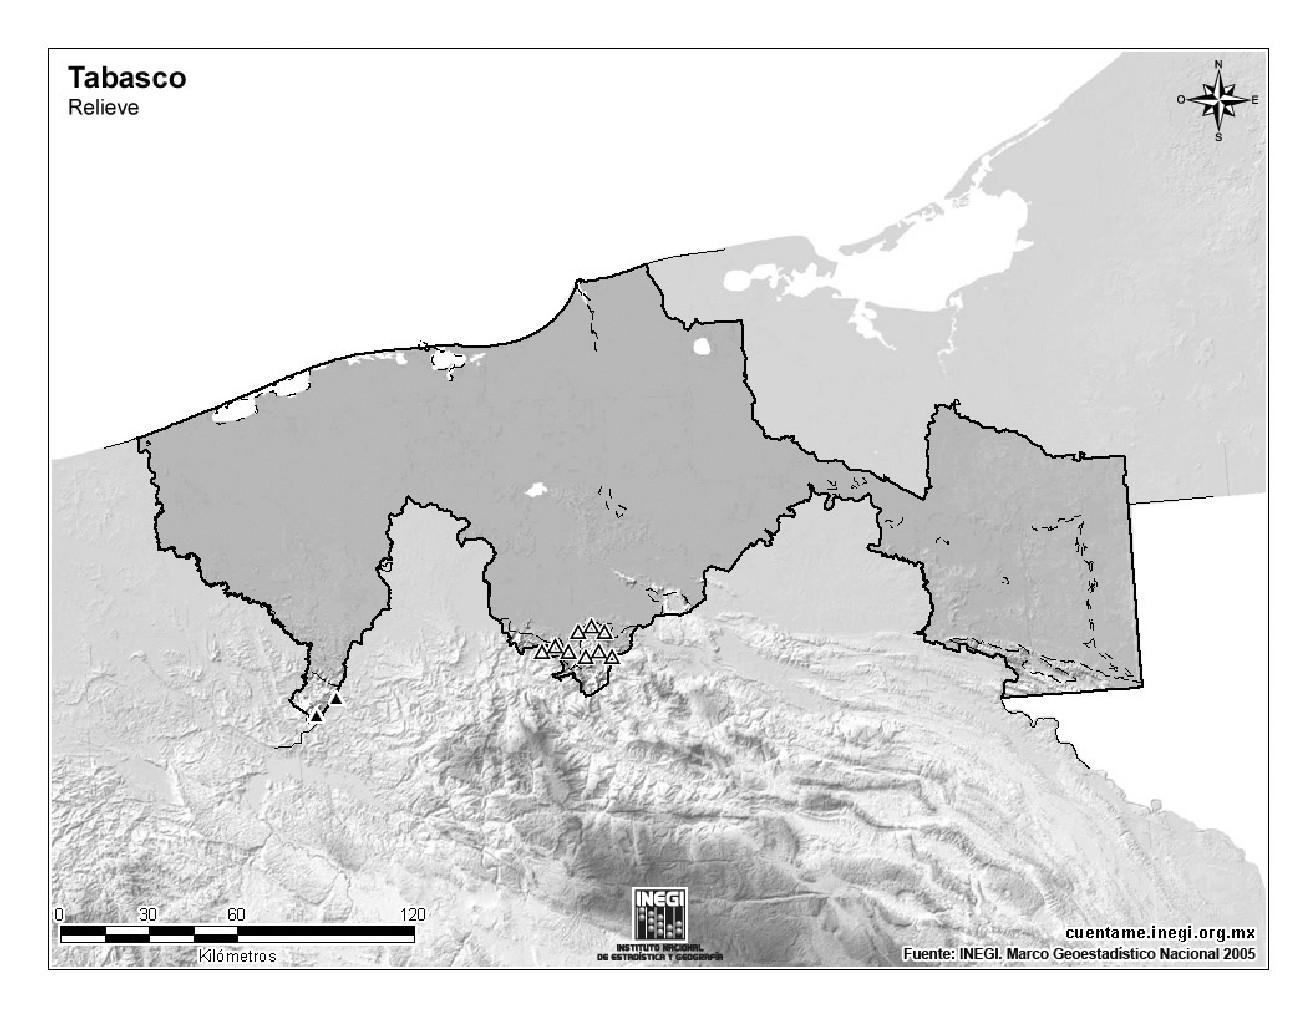 Mapa mudo de montañas de Tabasco. INEGI de México